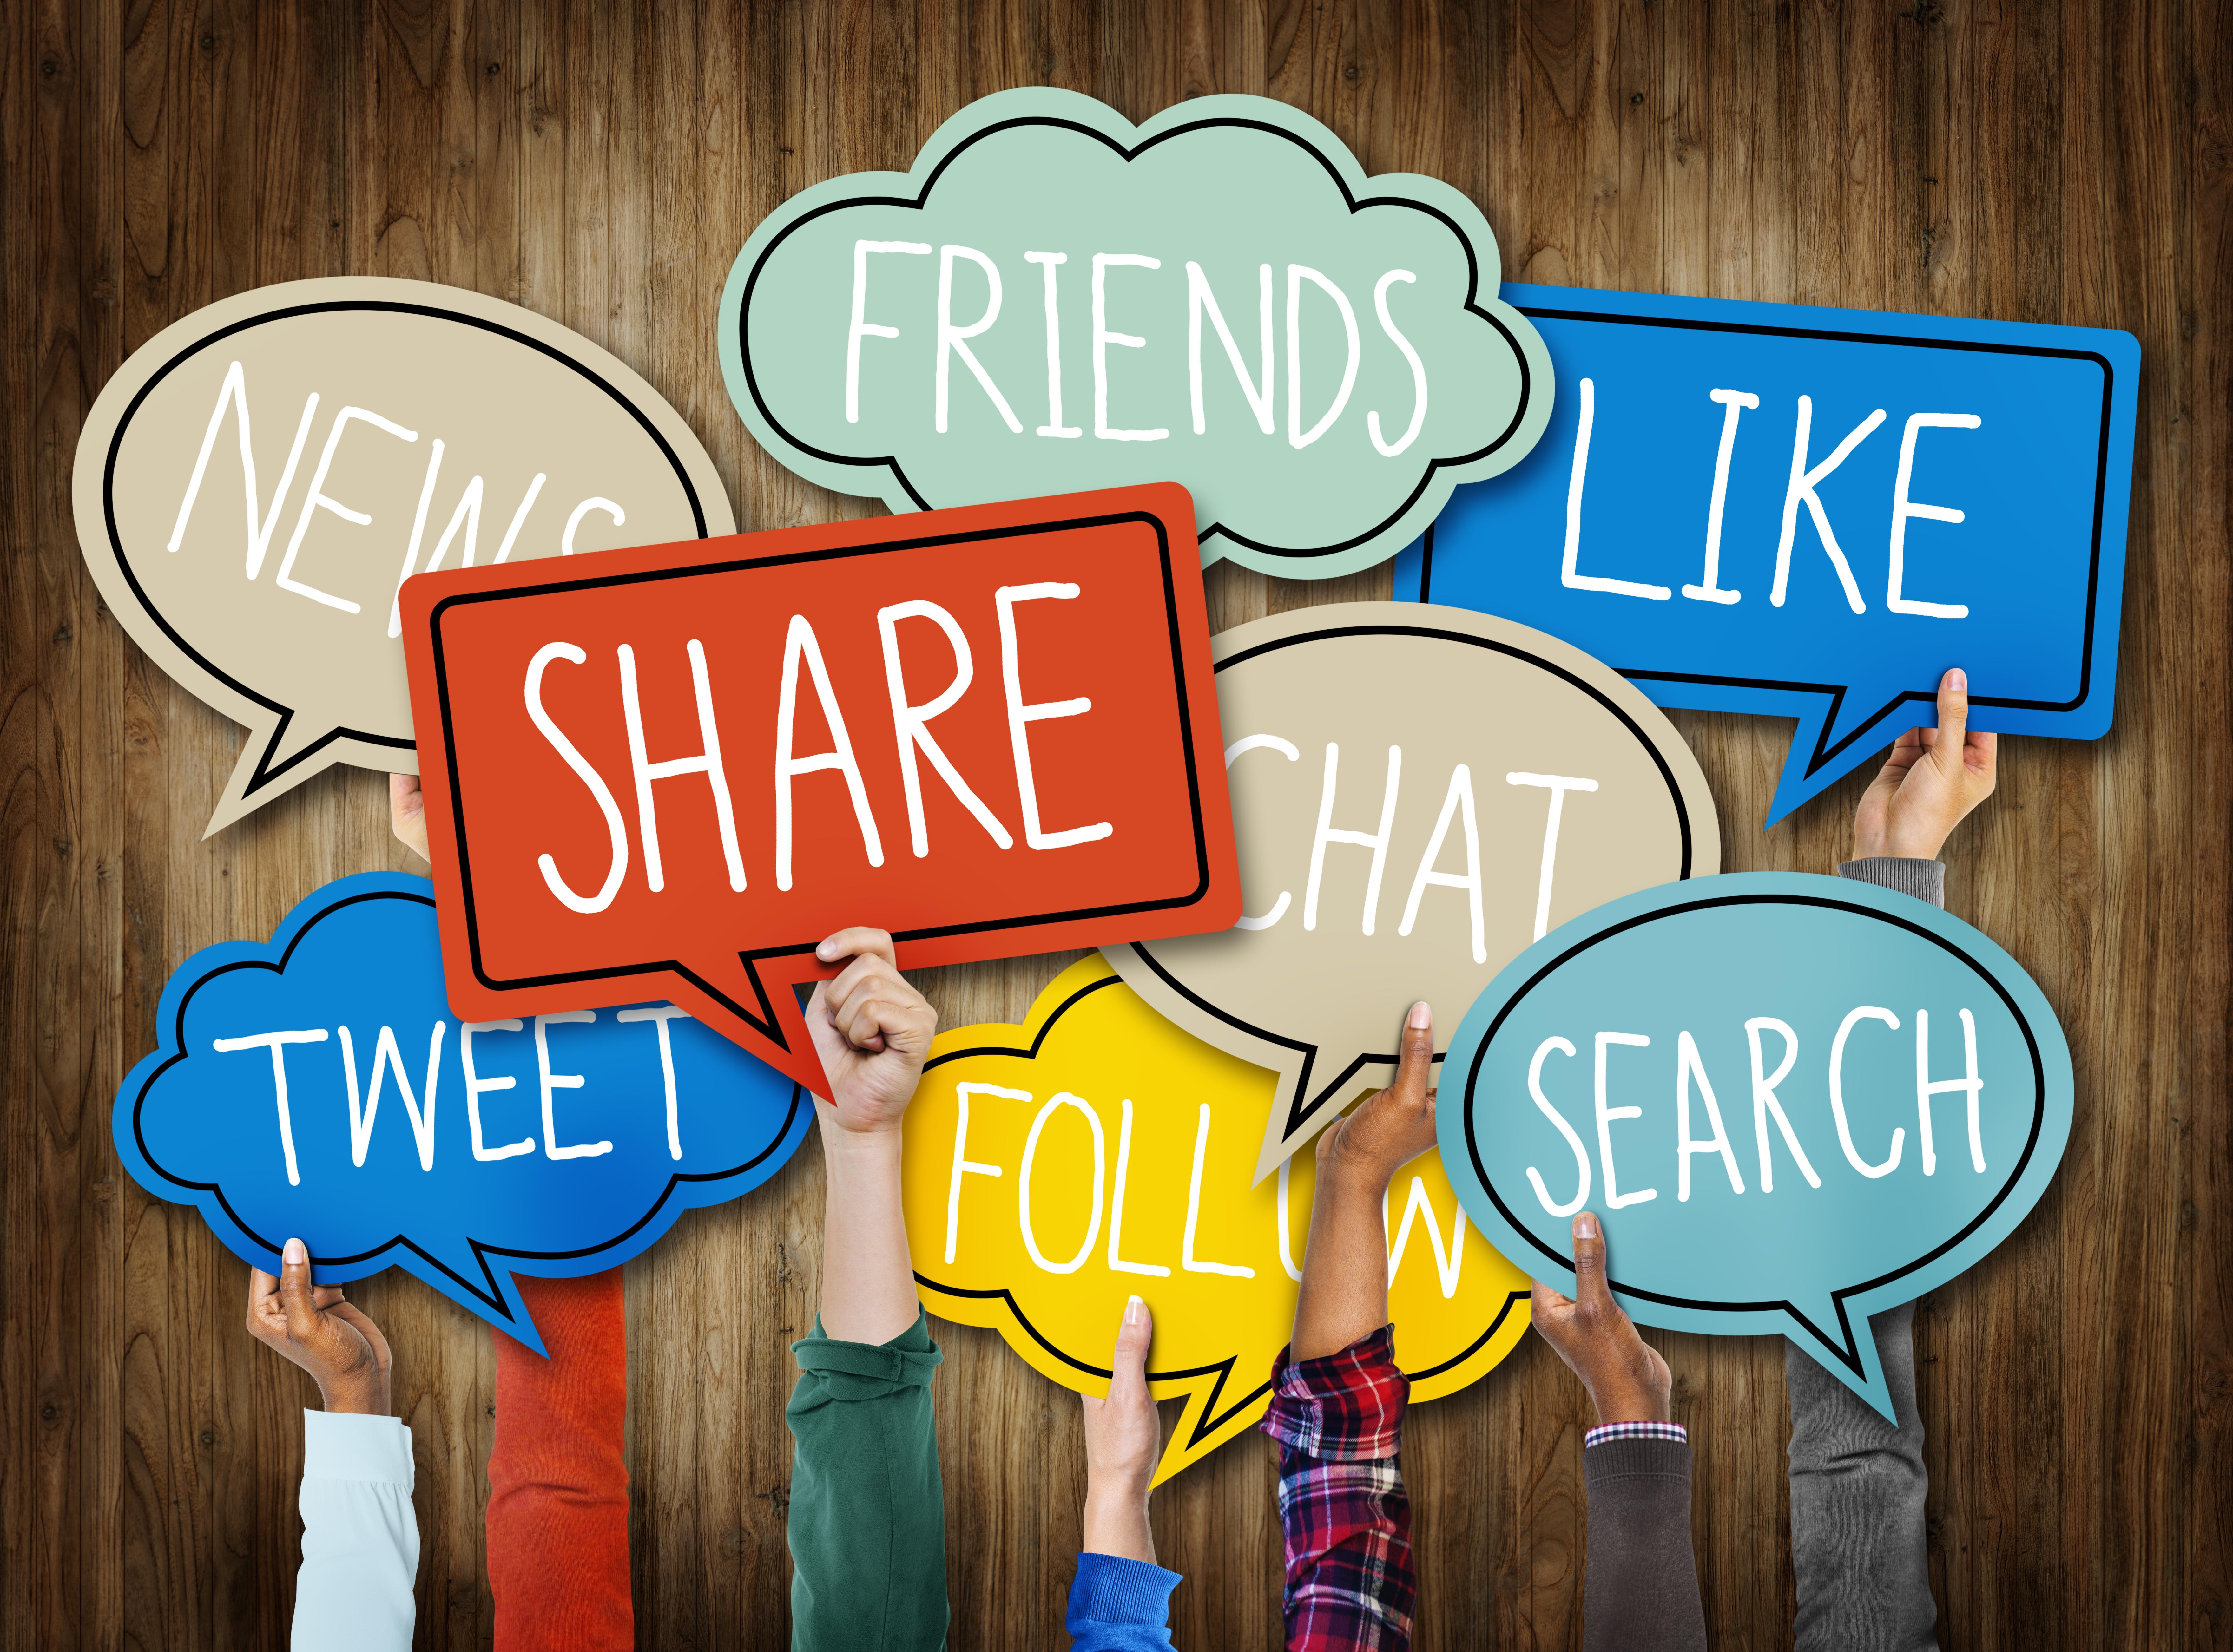 4-tendencias-en-social-media-para-2018.jpg